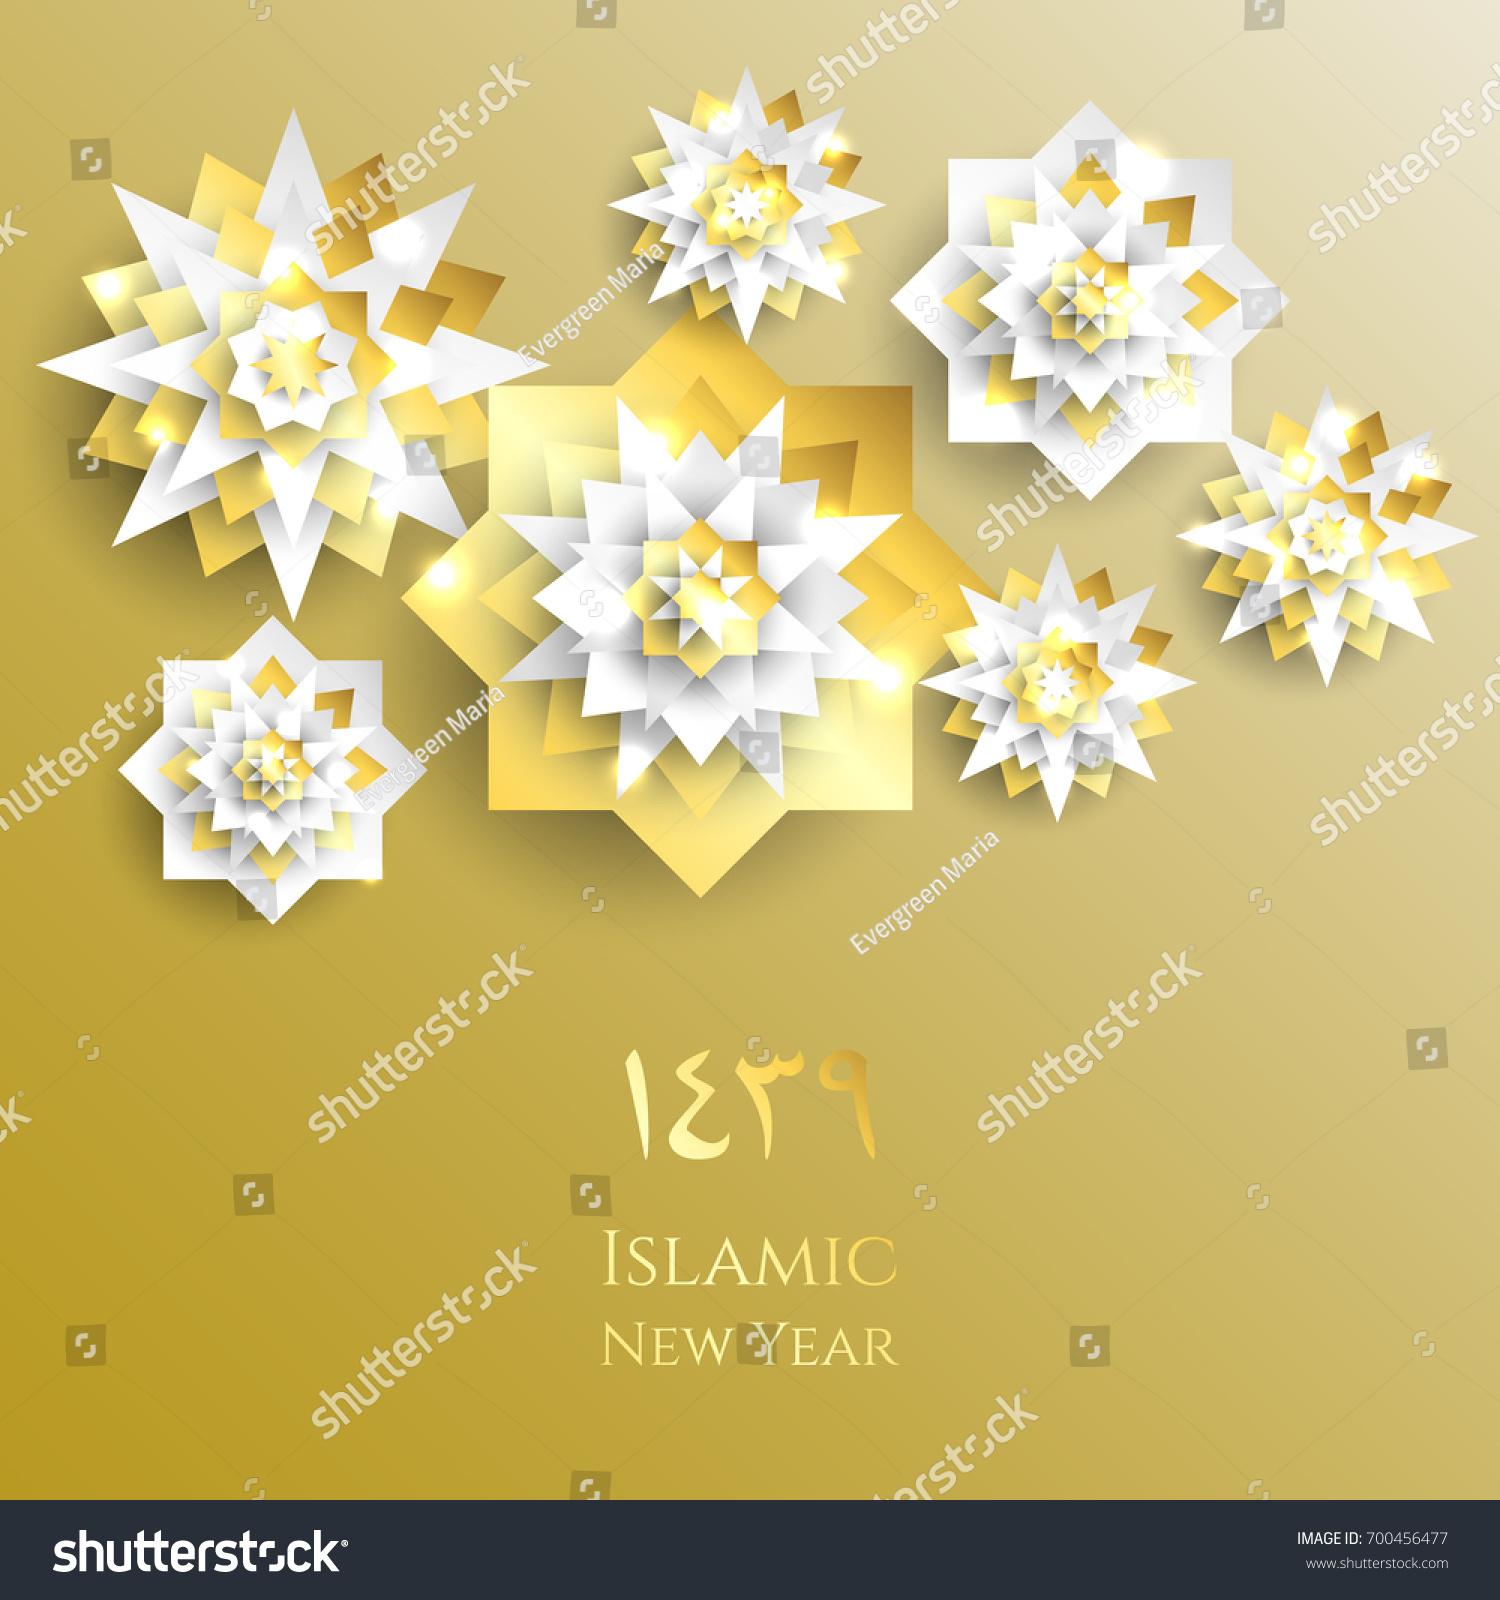 1439 hijri islamic new year happy stock vector 700456477 shutterstock 1439 hijri islamic new year happy muharram muslim community festival eid al ul adha kristyandbryce Images